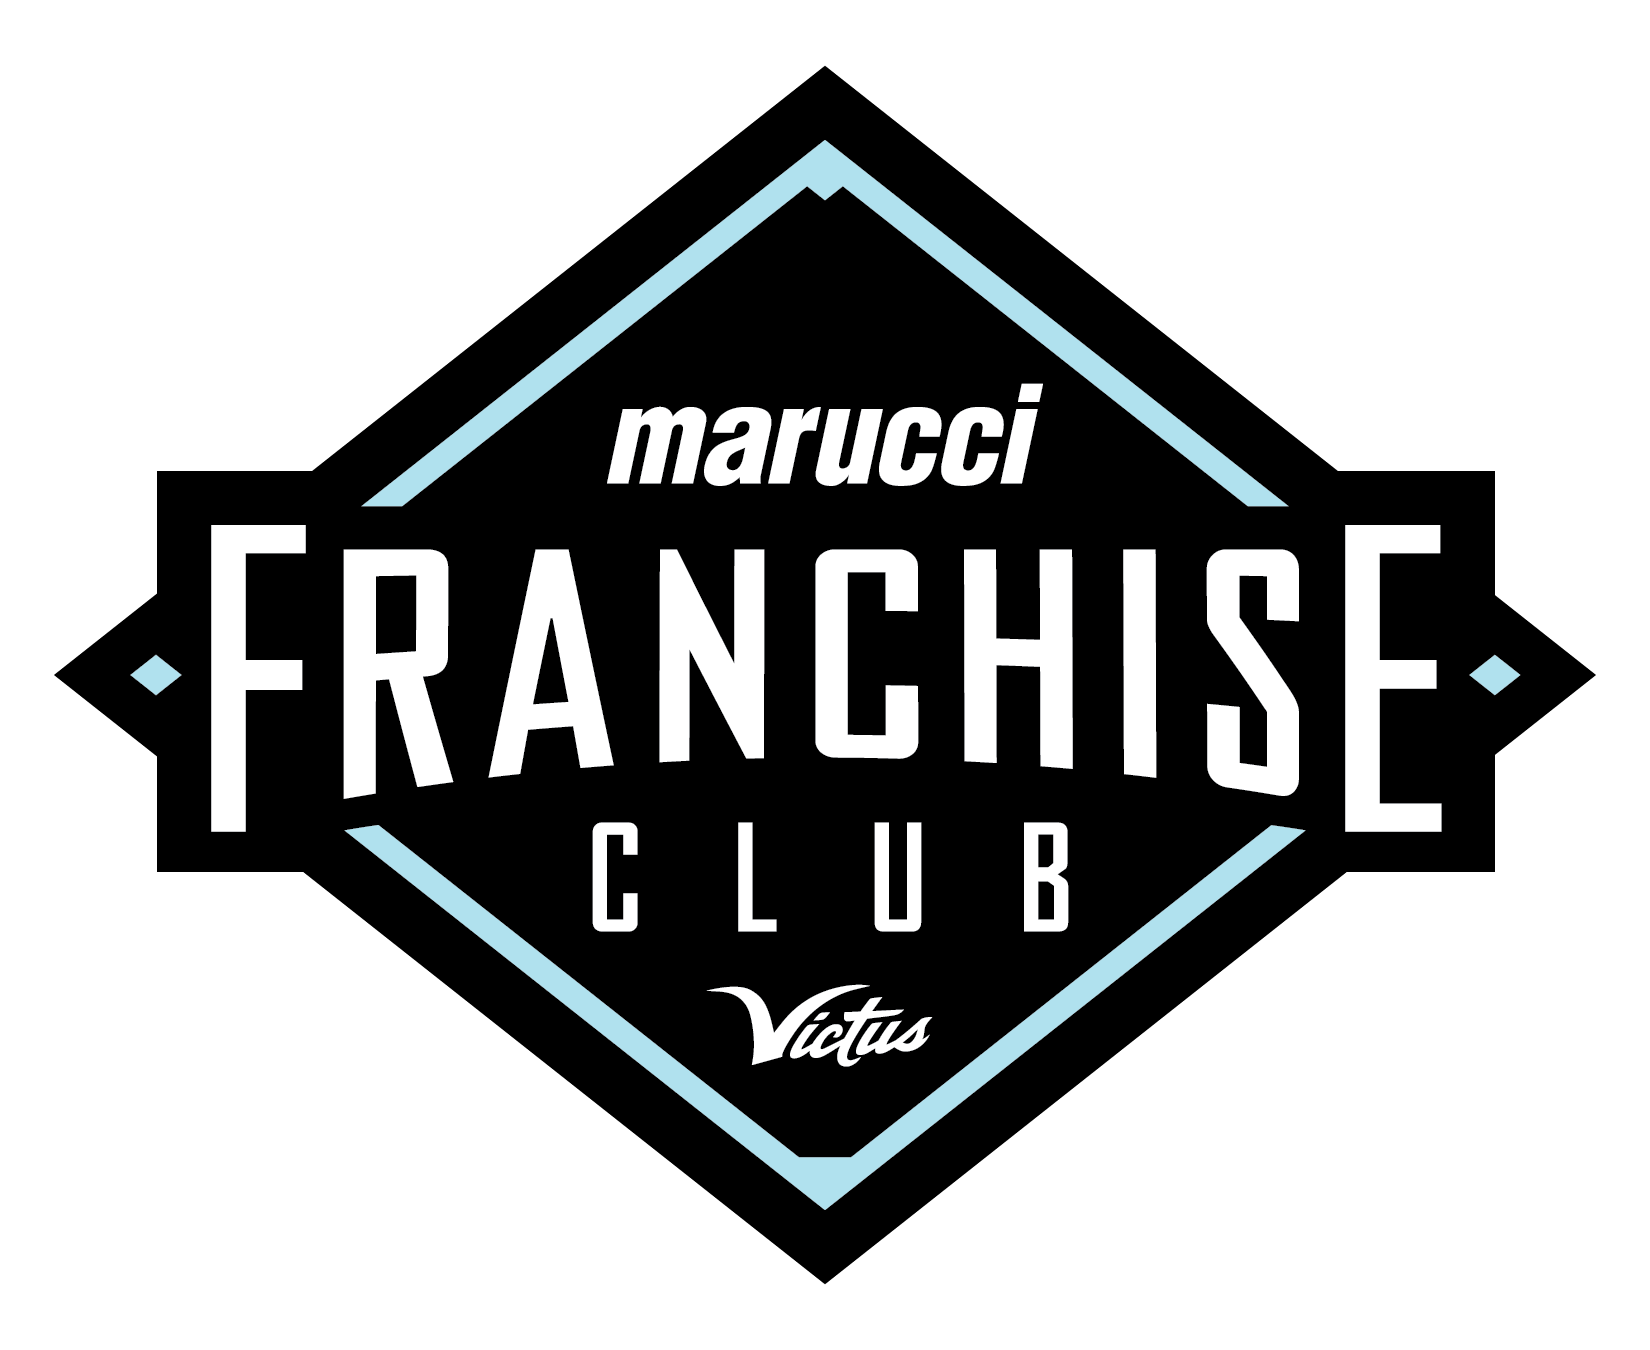 marucci Franchise logo